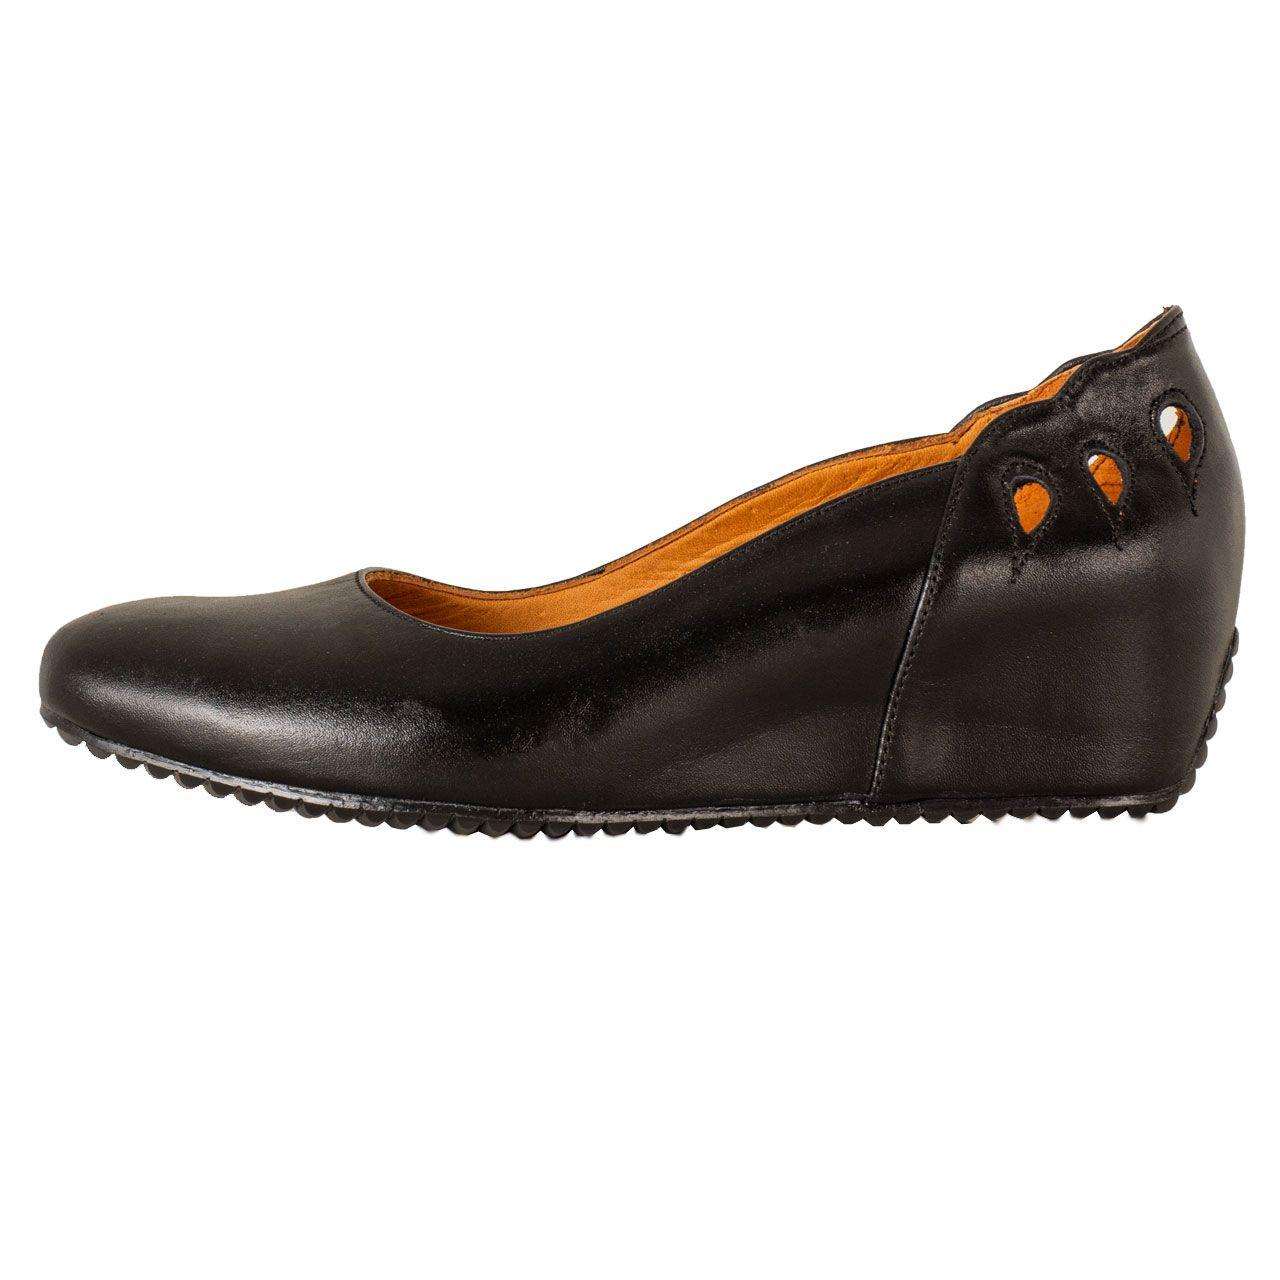 کفش روزمره زنانه پارینه چرم مدل SHOW31